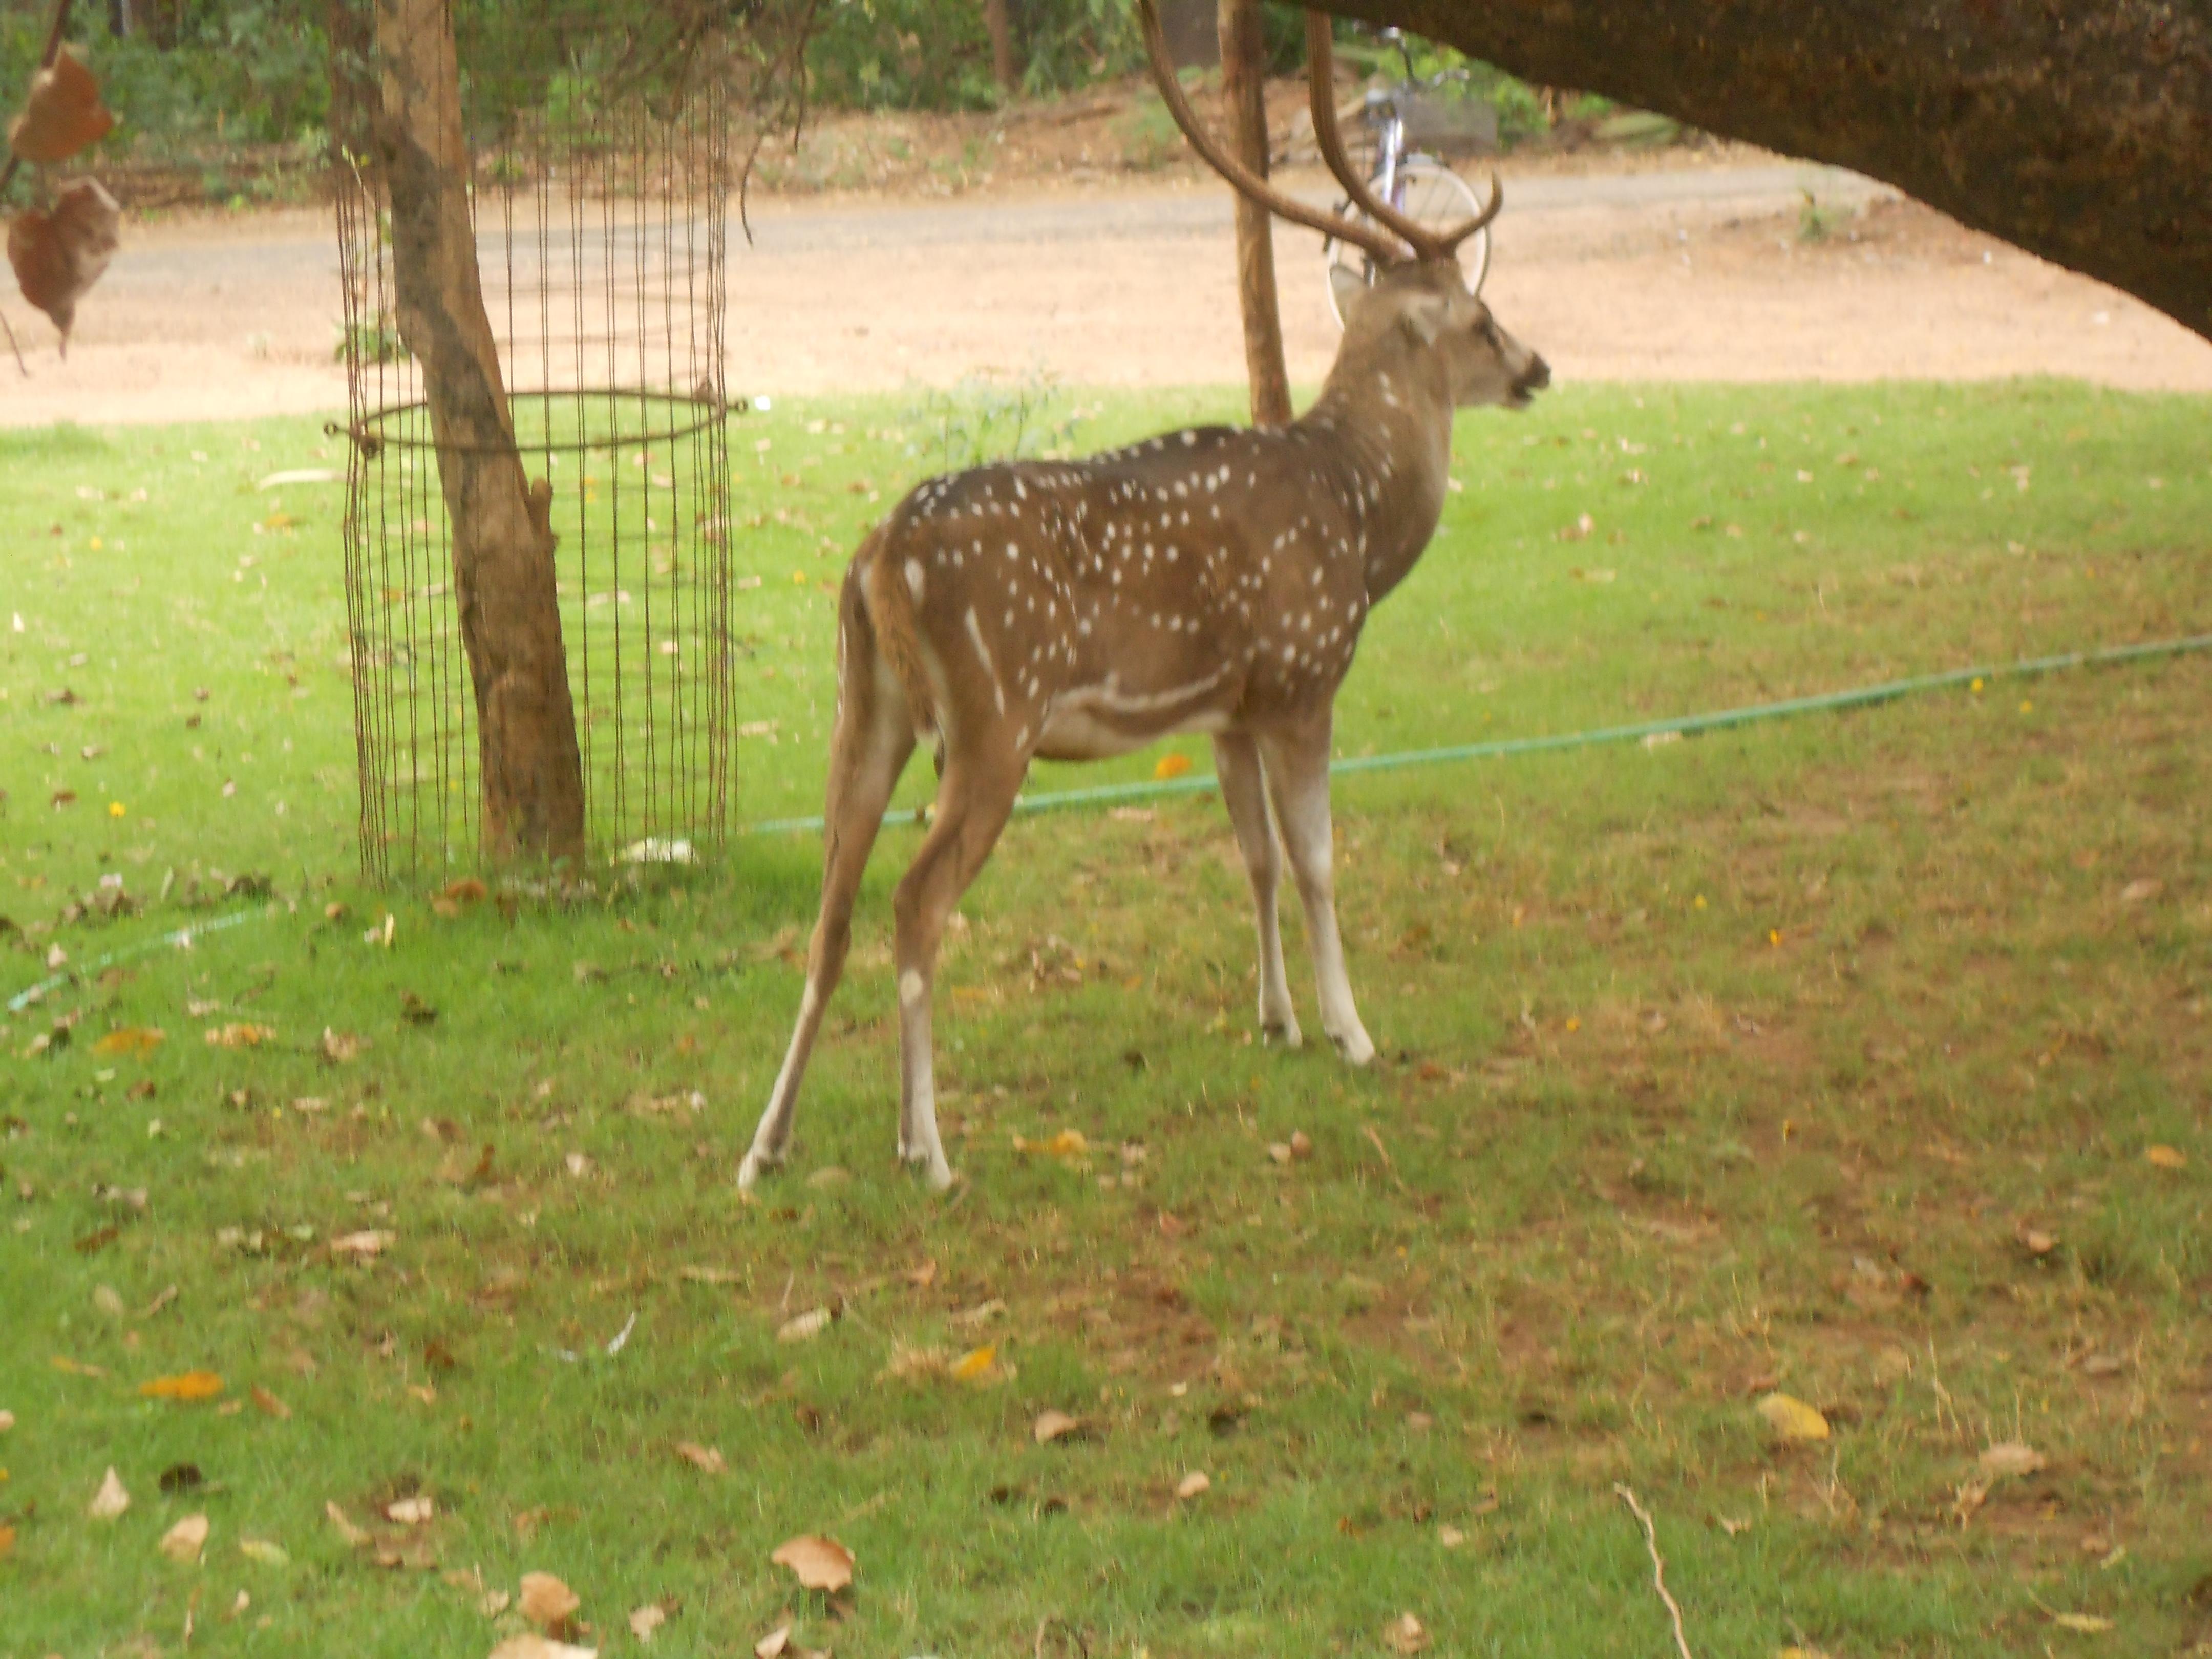 IIT Madras Wikipedia: File:Deer In IIT Madras.jpg